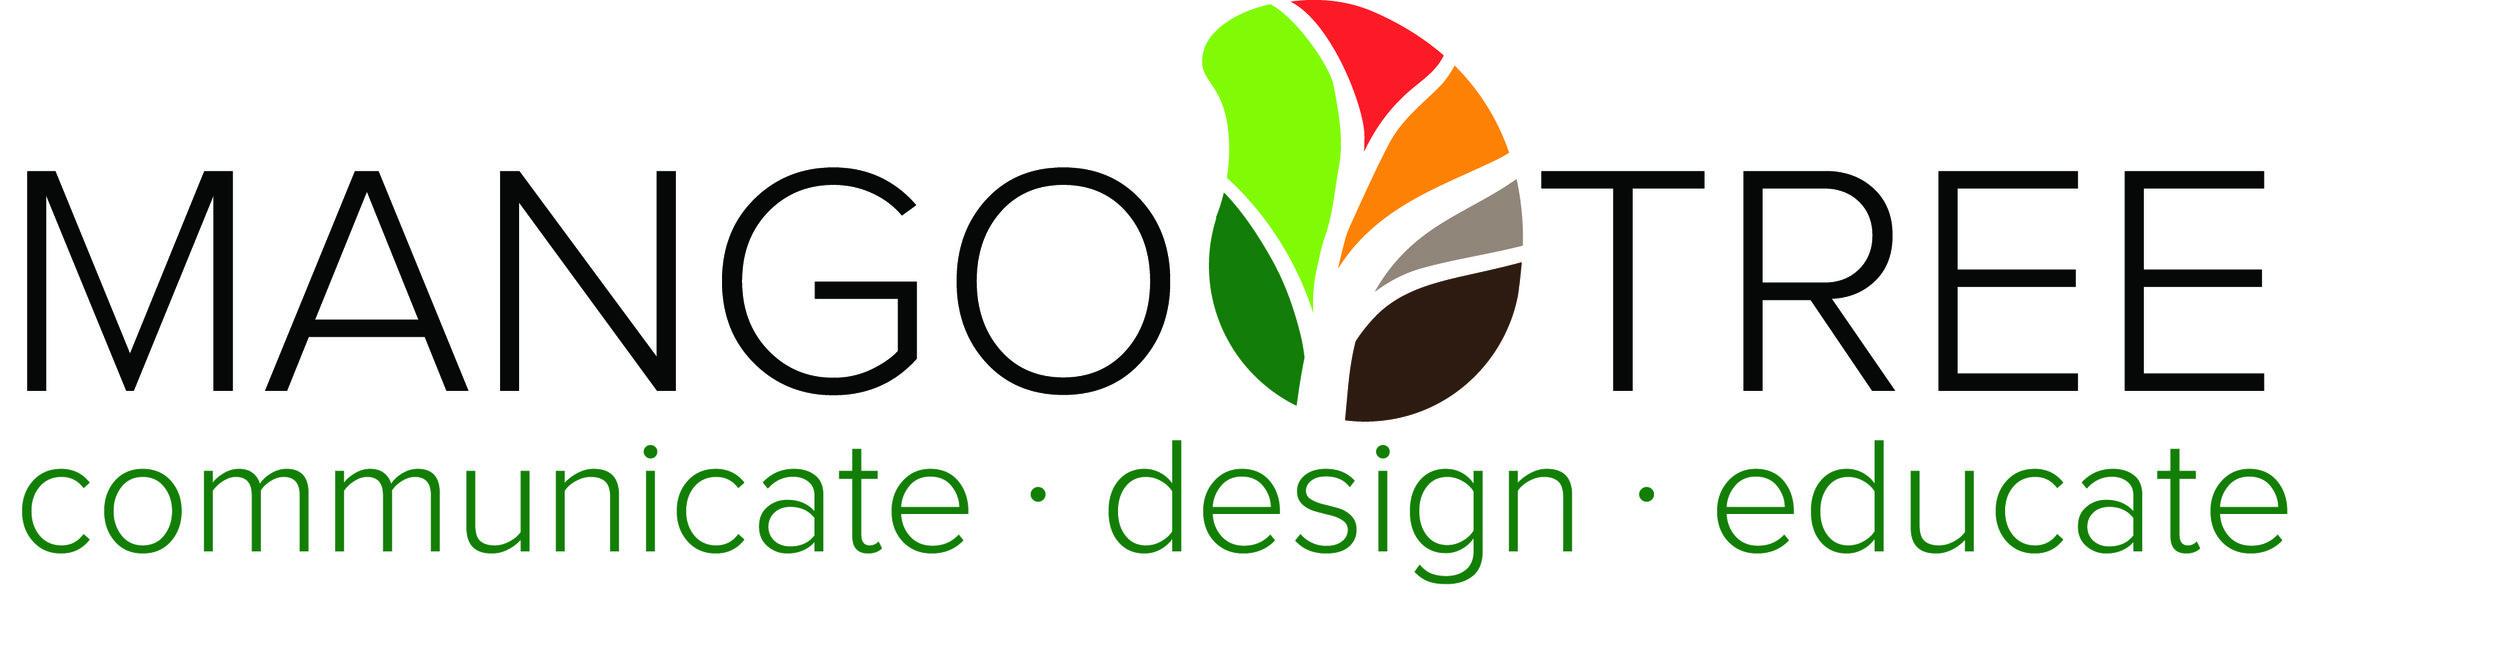 Copy of MT logo new_CMYK - Monica Kansiime.jpg